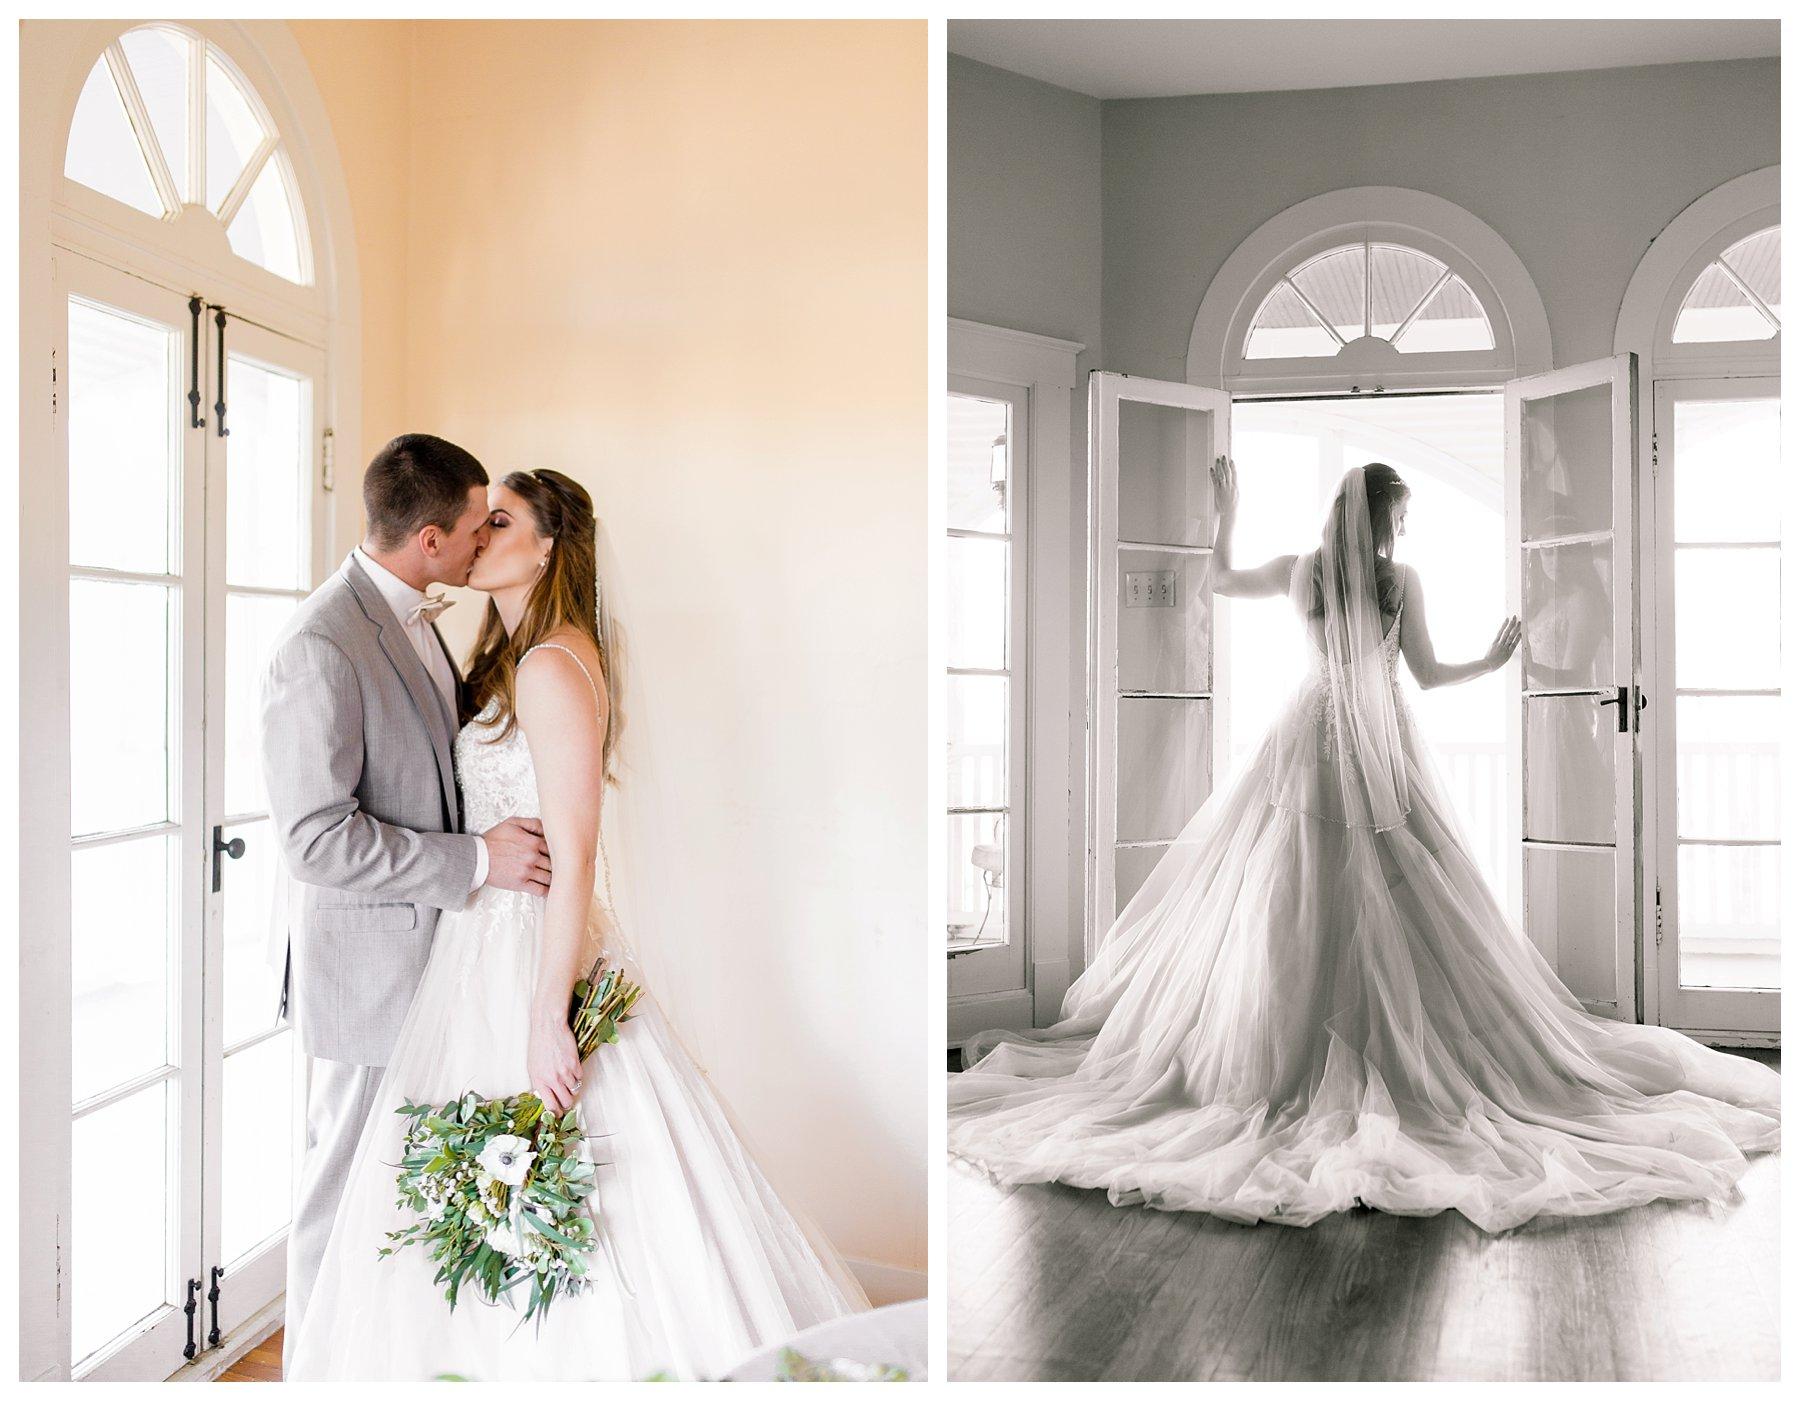 photographer_wedding_saint_louis_Kansas_City_Photography_Videography_workshop_training_styled_engagement_Lake_Ozark_KC_MO_STL_Rolla_Hermann_Saint_James_0395.jpg